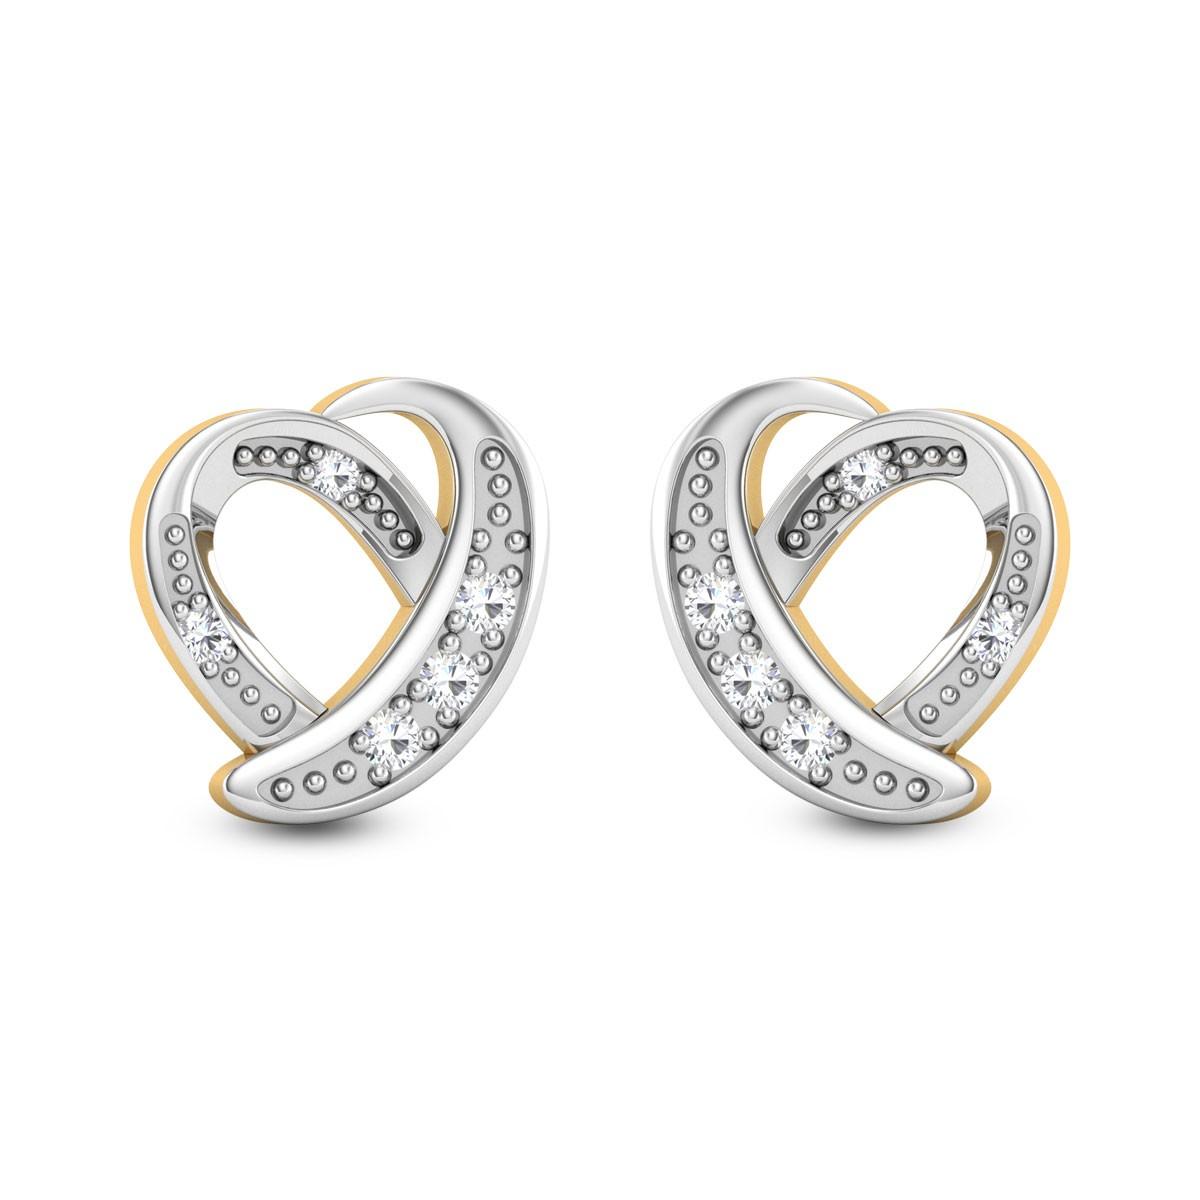 Amata Heart Diamond Stud Earrings